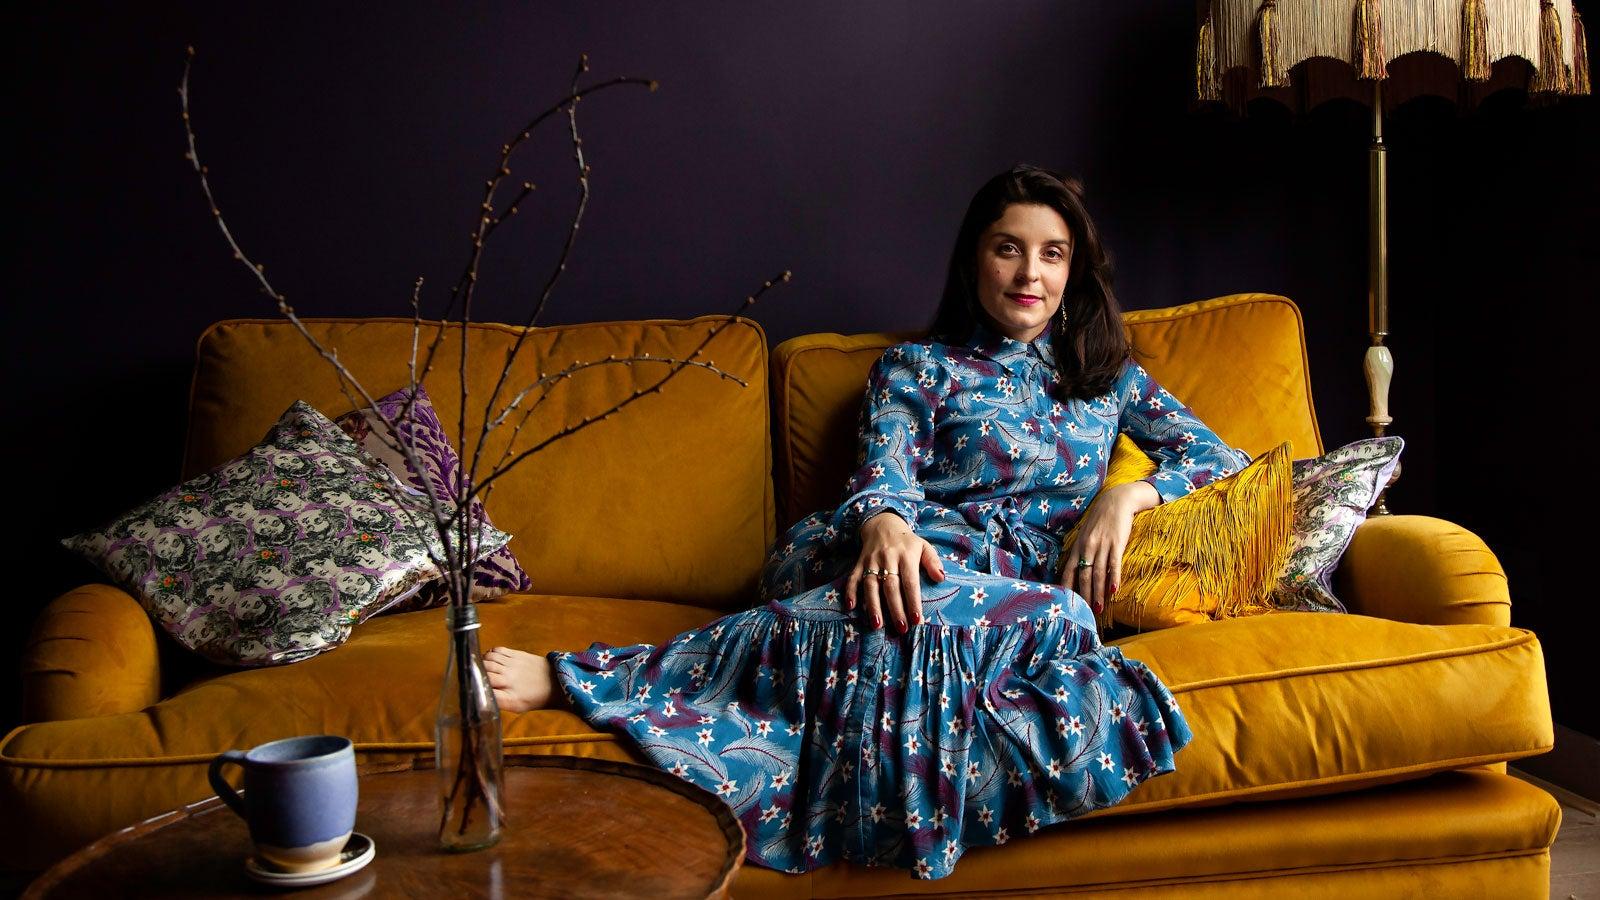 Jessie Burton sits in a blue dress on a yellow velvet sofa